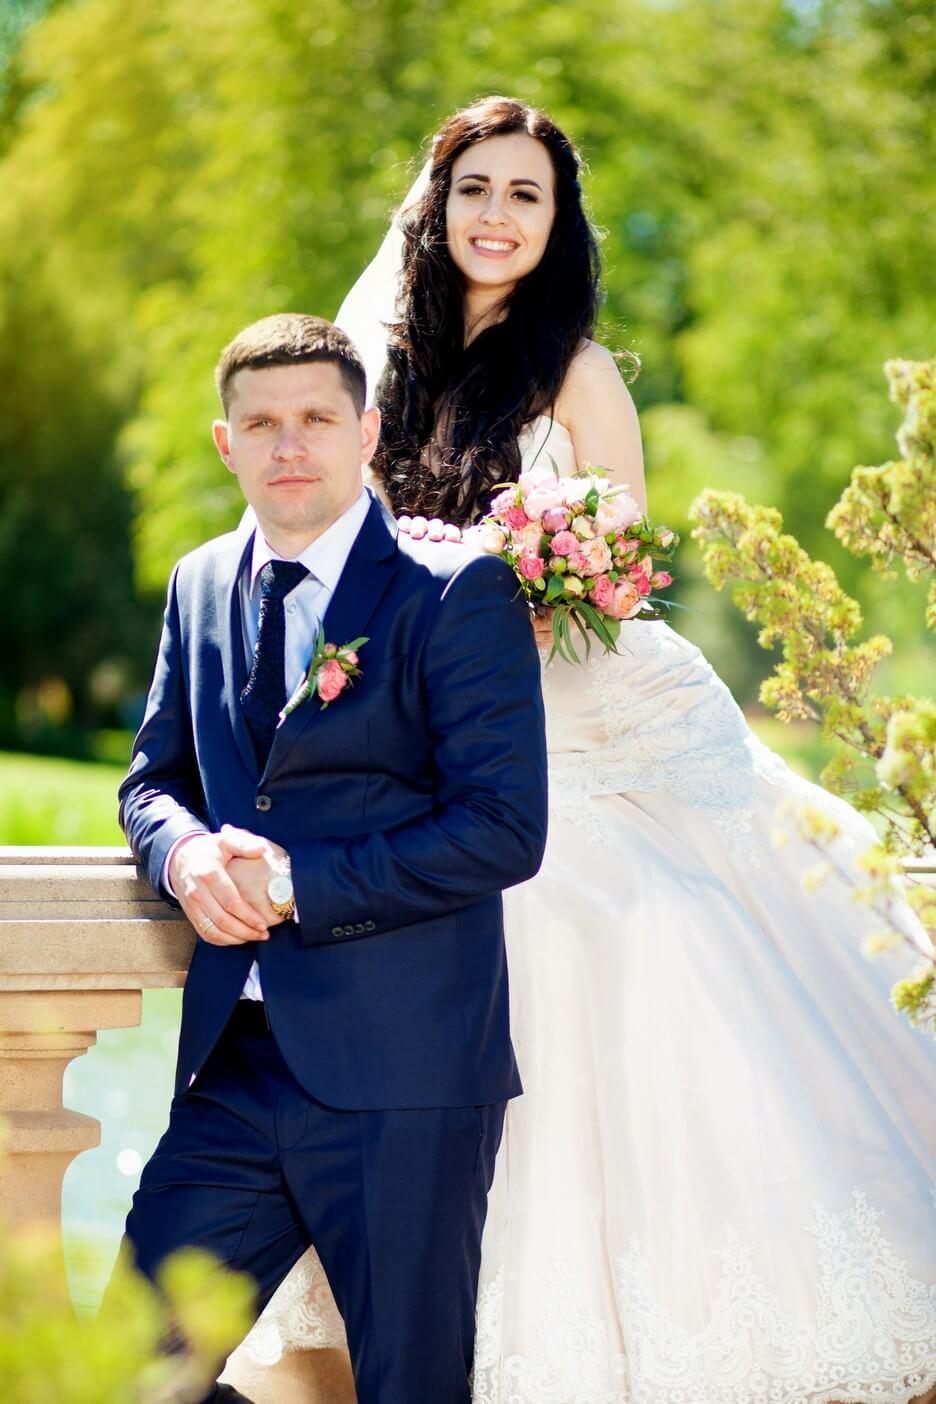 professional'nyj fotograf kiev ceny fotosessii kiev ceny fotograf na svad'bu v kieve (7)